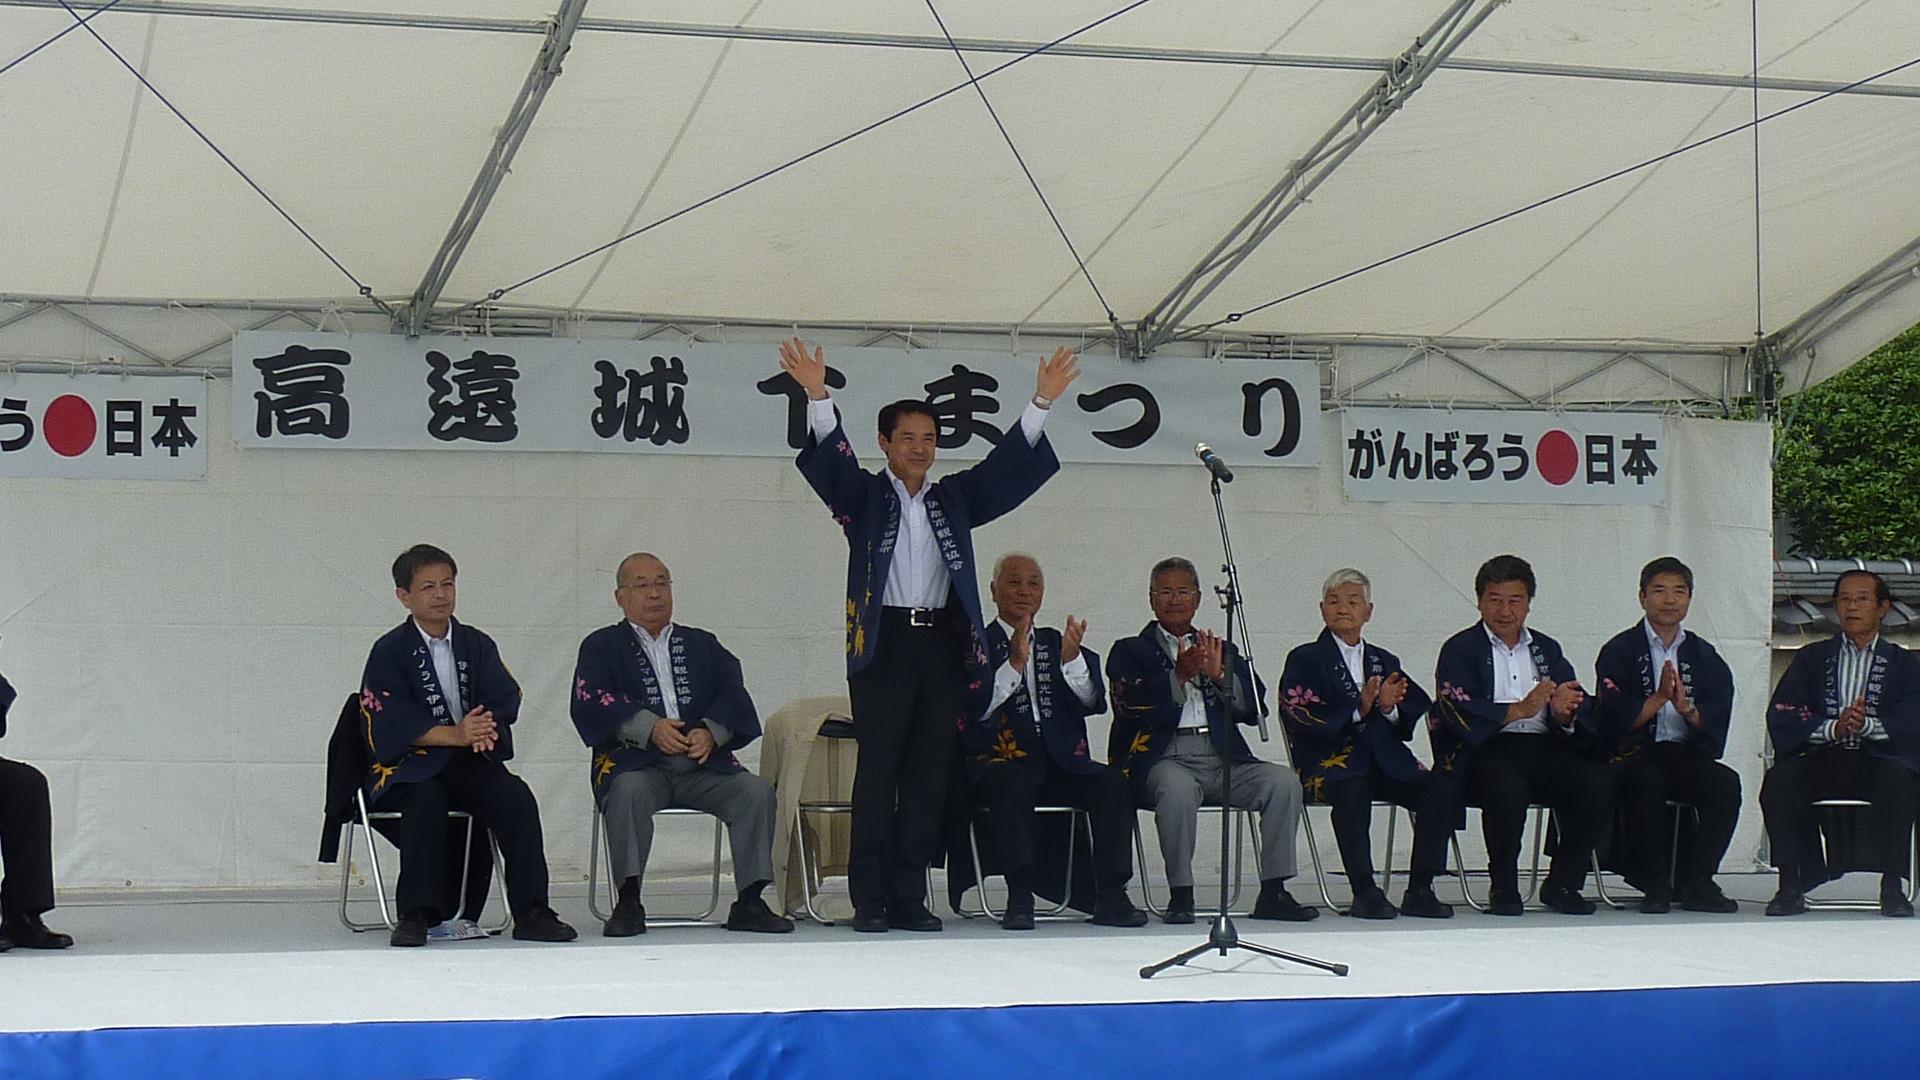 高遠城下祭り27,9開会式